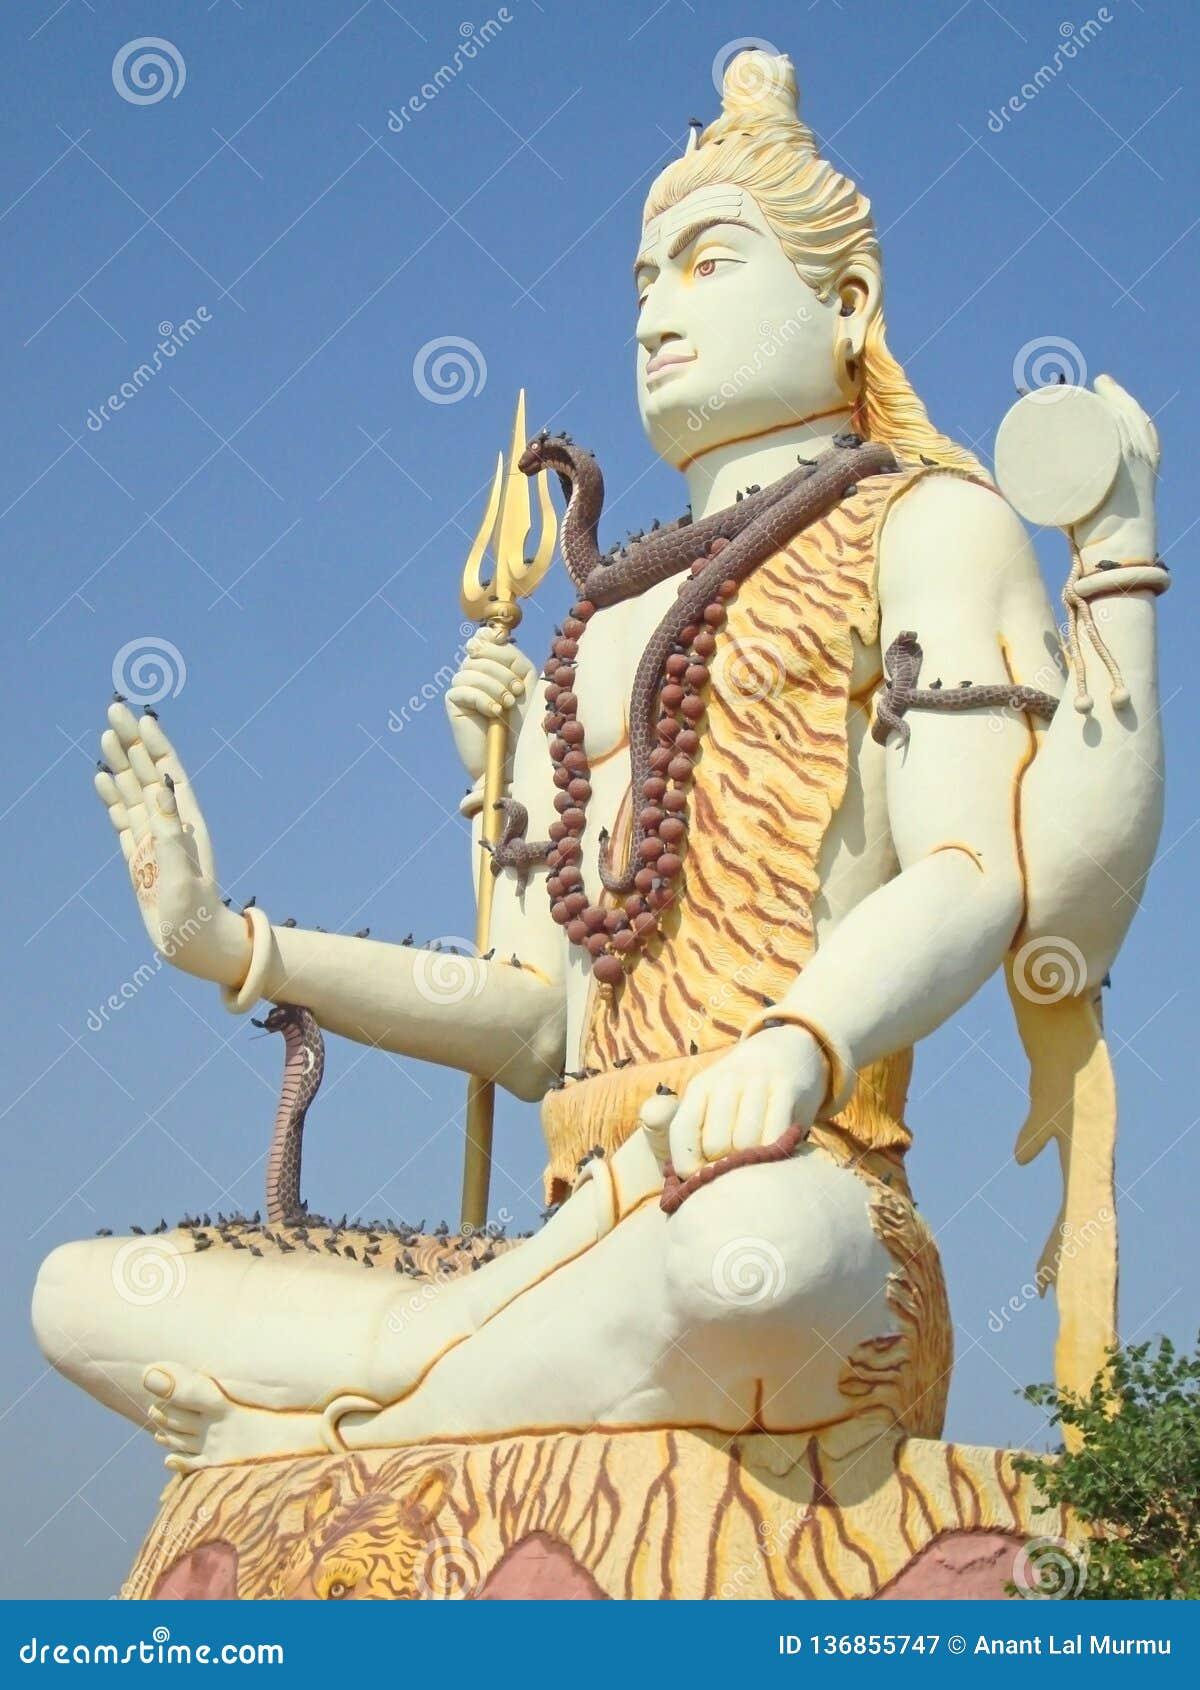 Lord Shiva Statue in Gujarat